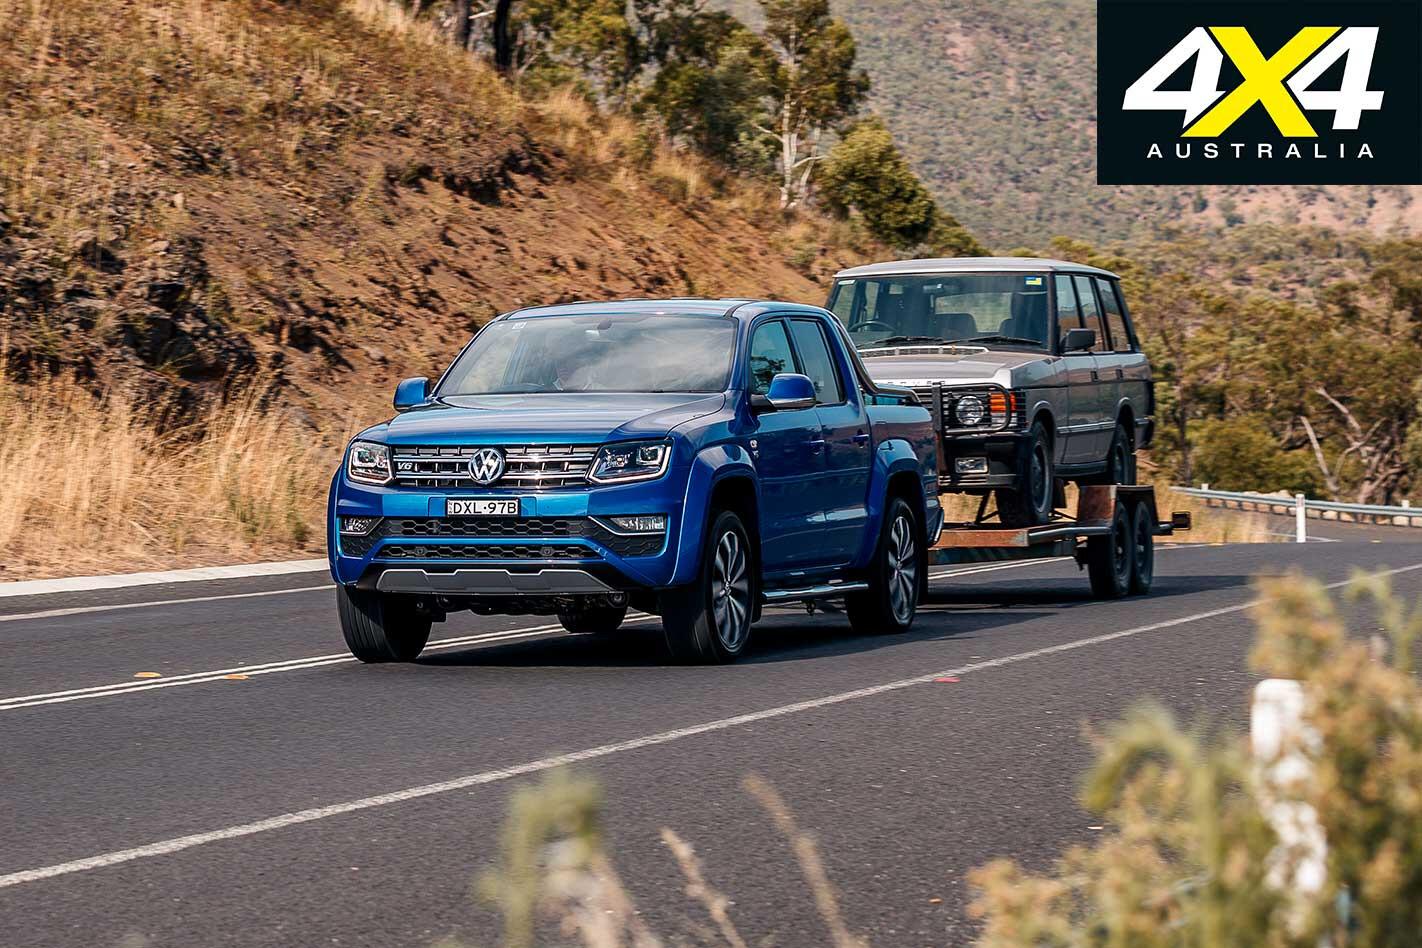 2019 Volkswagen Amarok 580 General Load And Tow Test Jpg